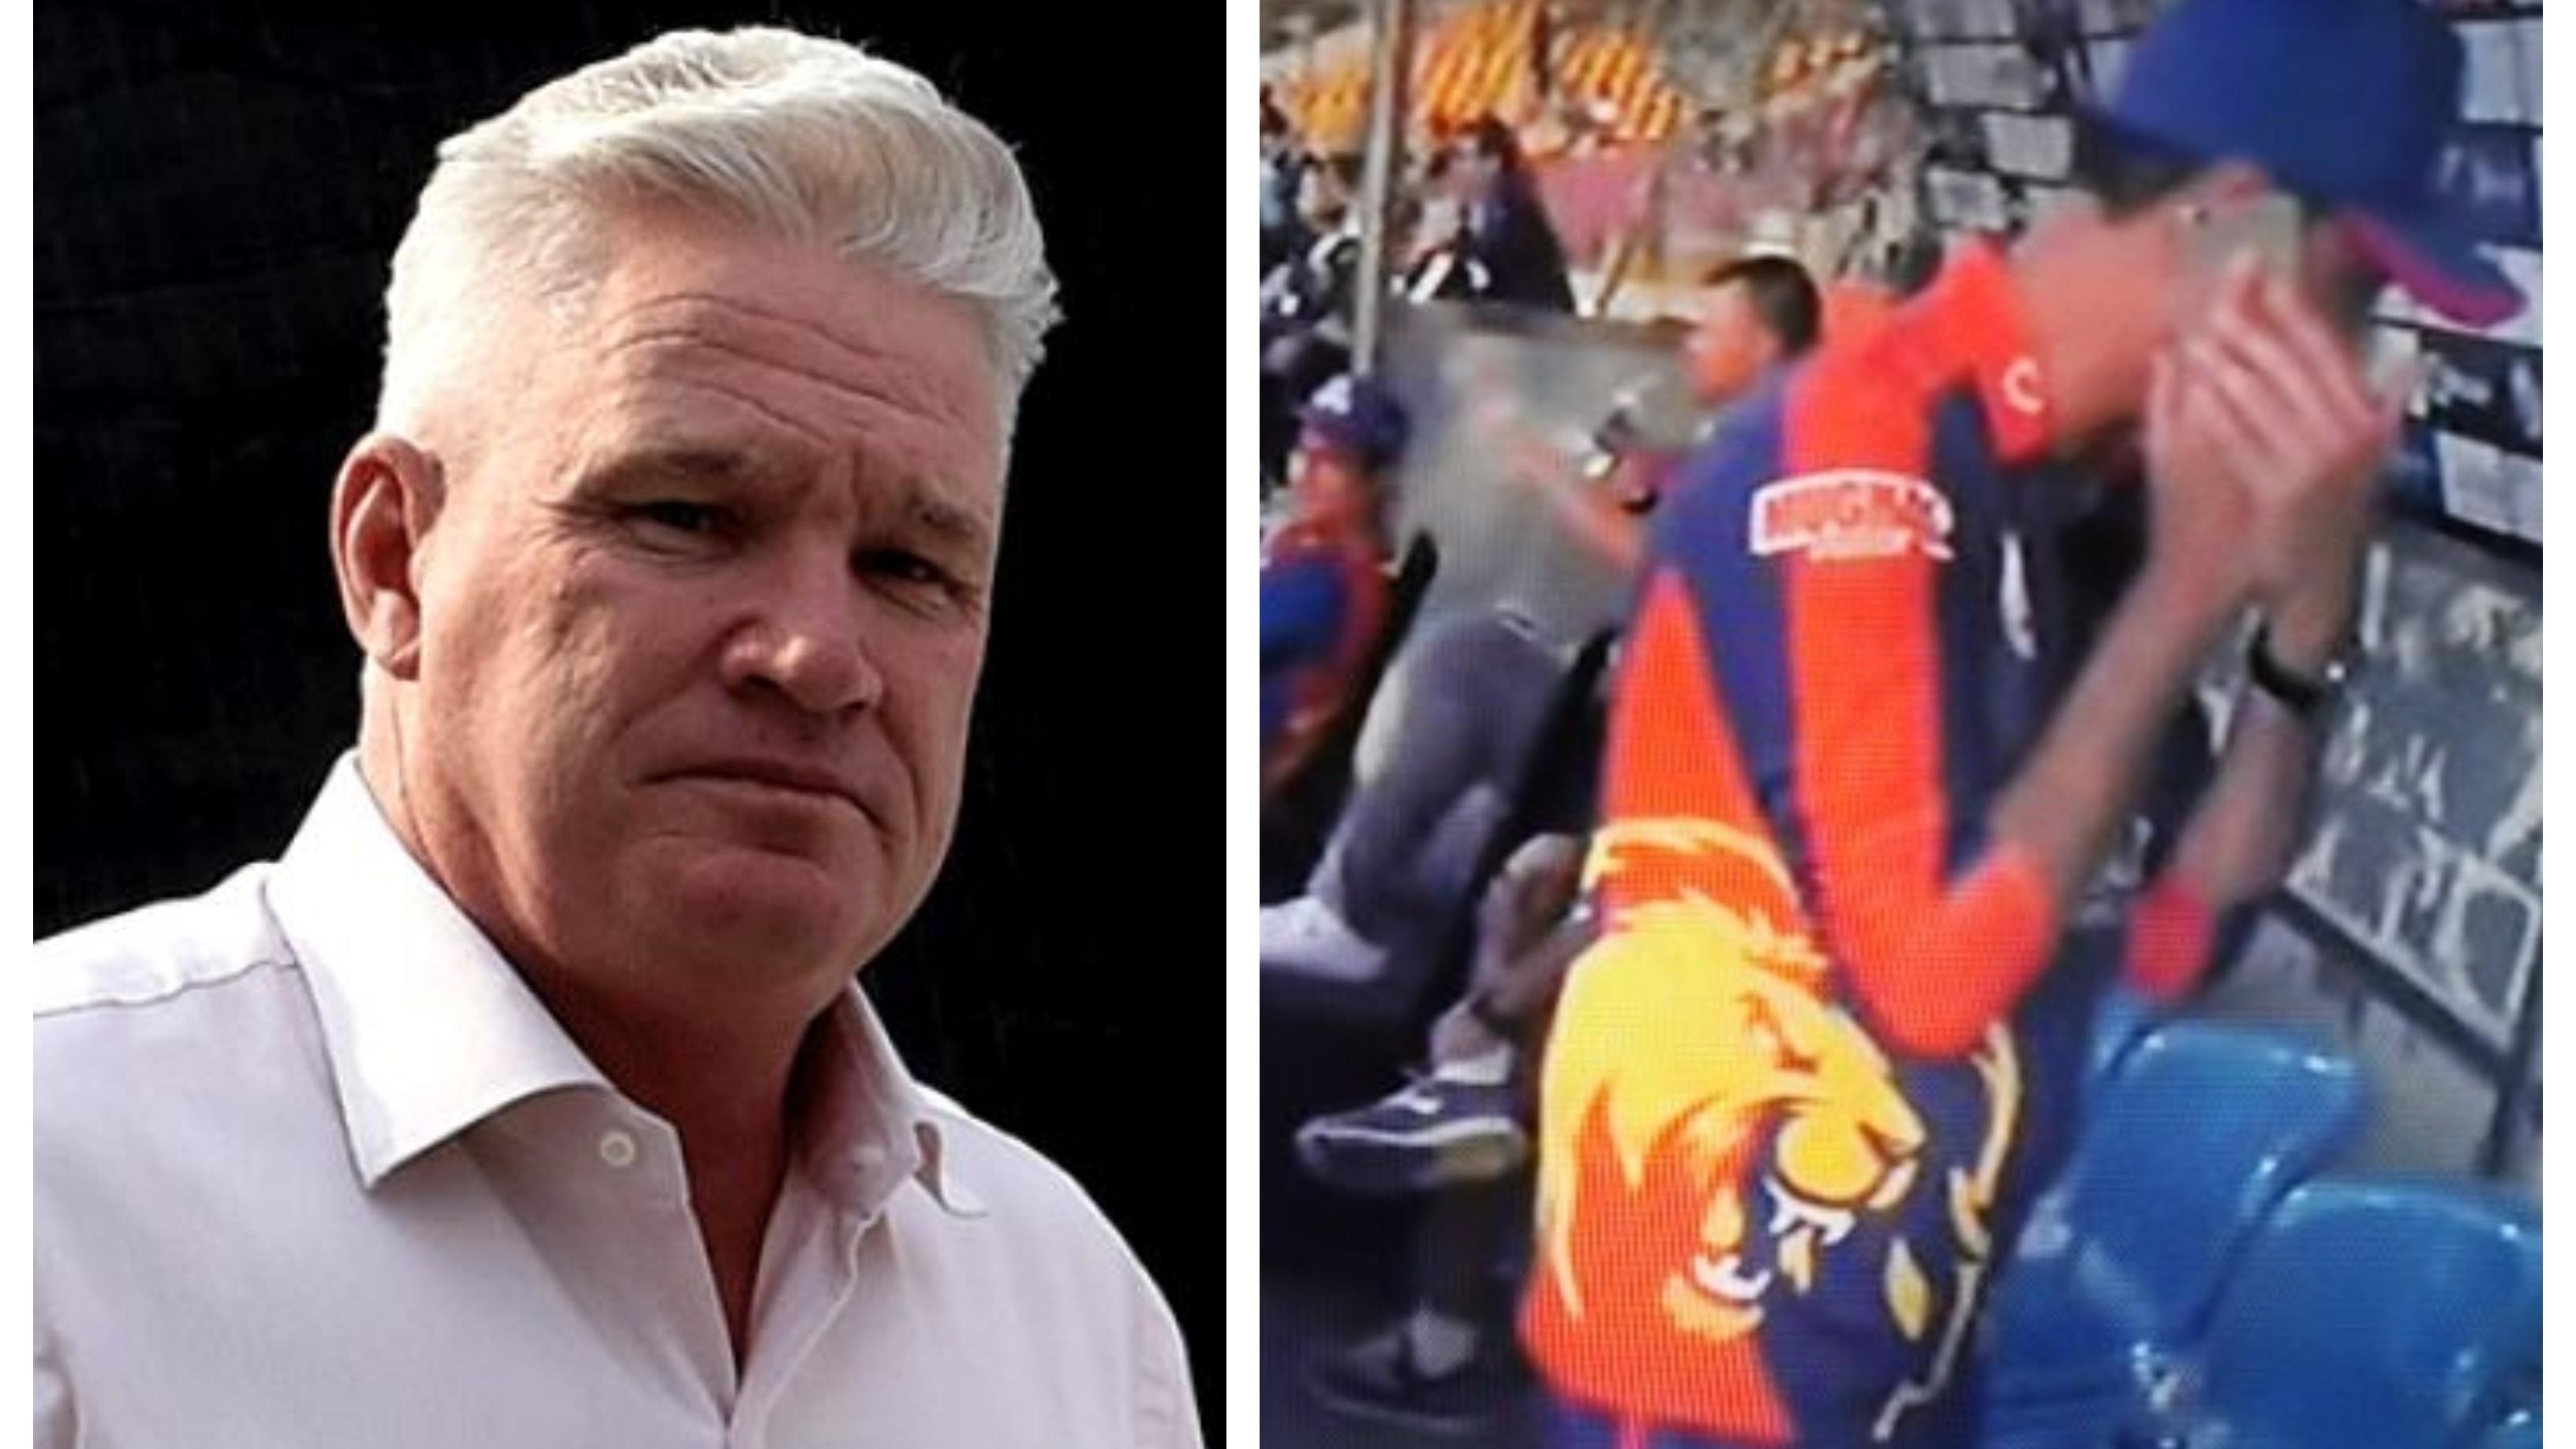 PSL 2020: Head coach Dean Jones clarifies why phone was being used in Karachi Kings dugout